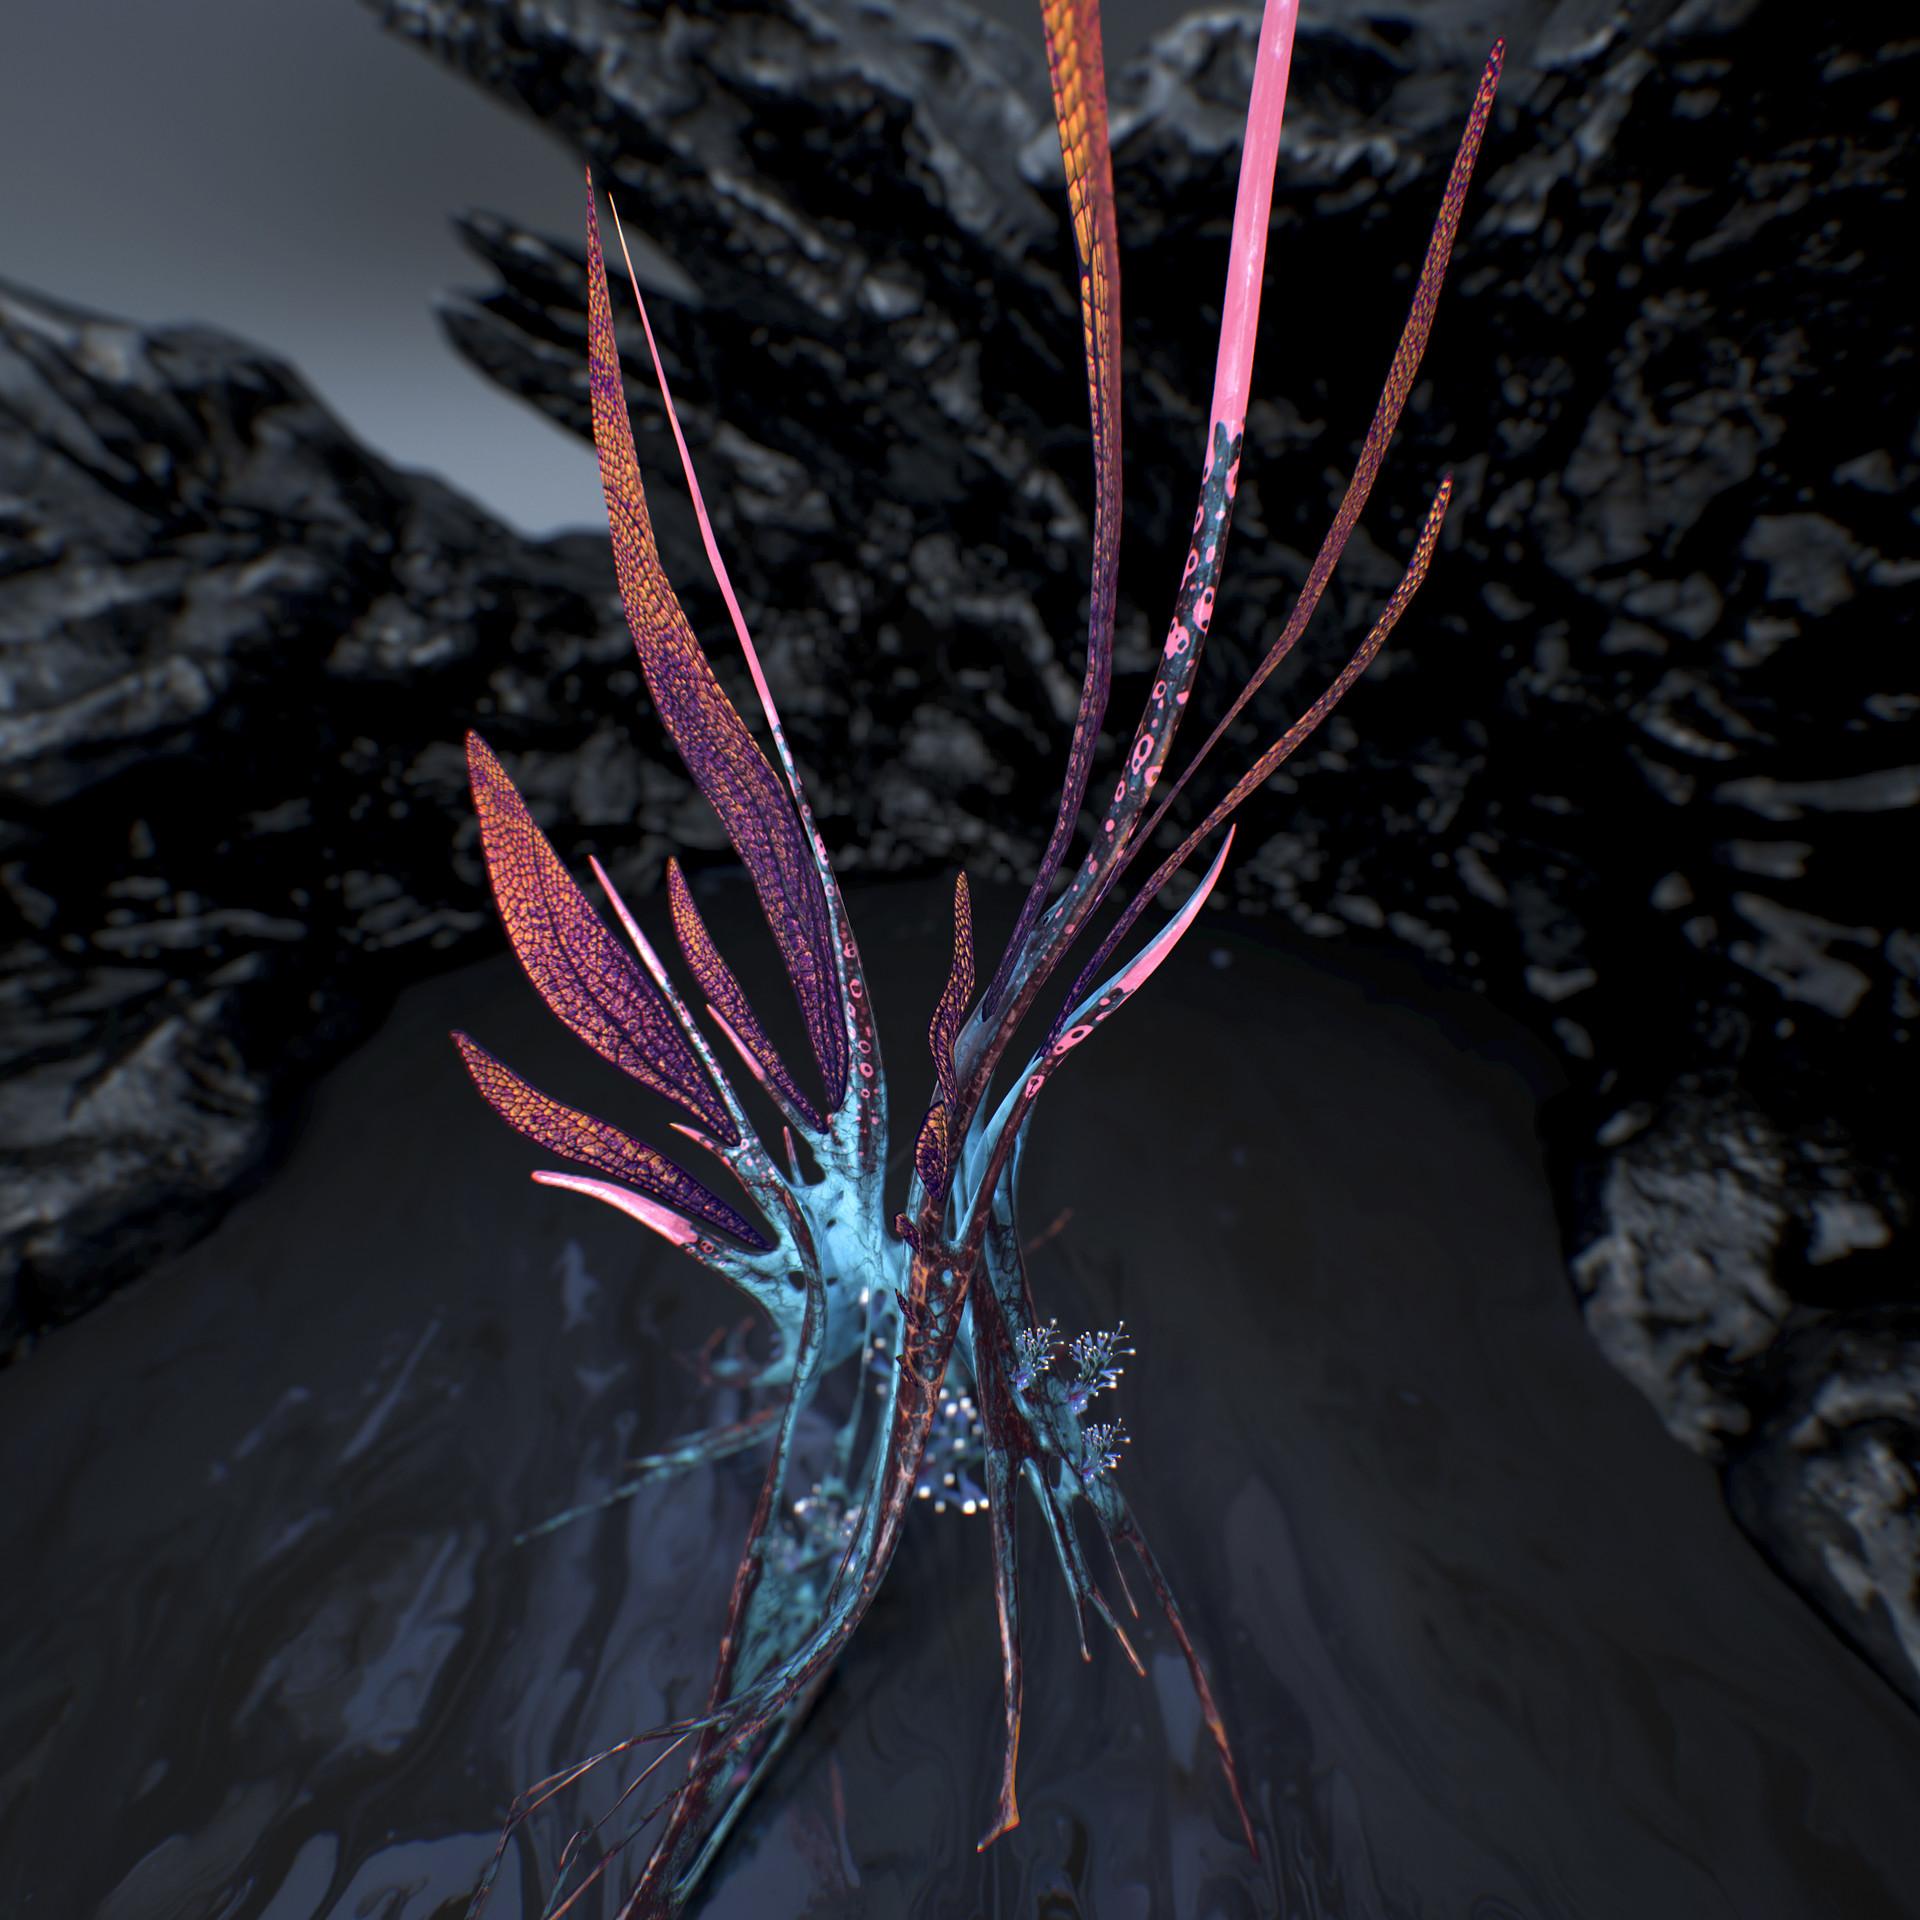 Johan de leenheer alien fern misota spletinus11